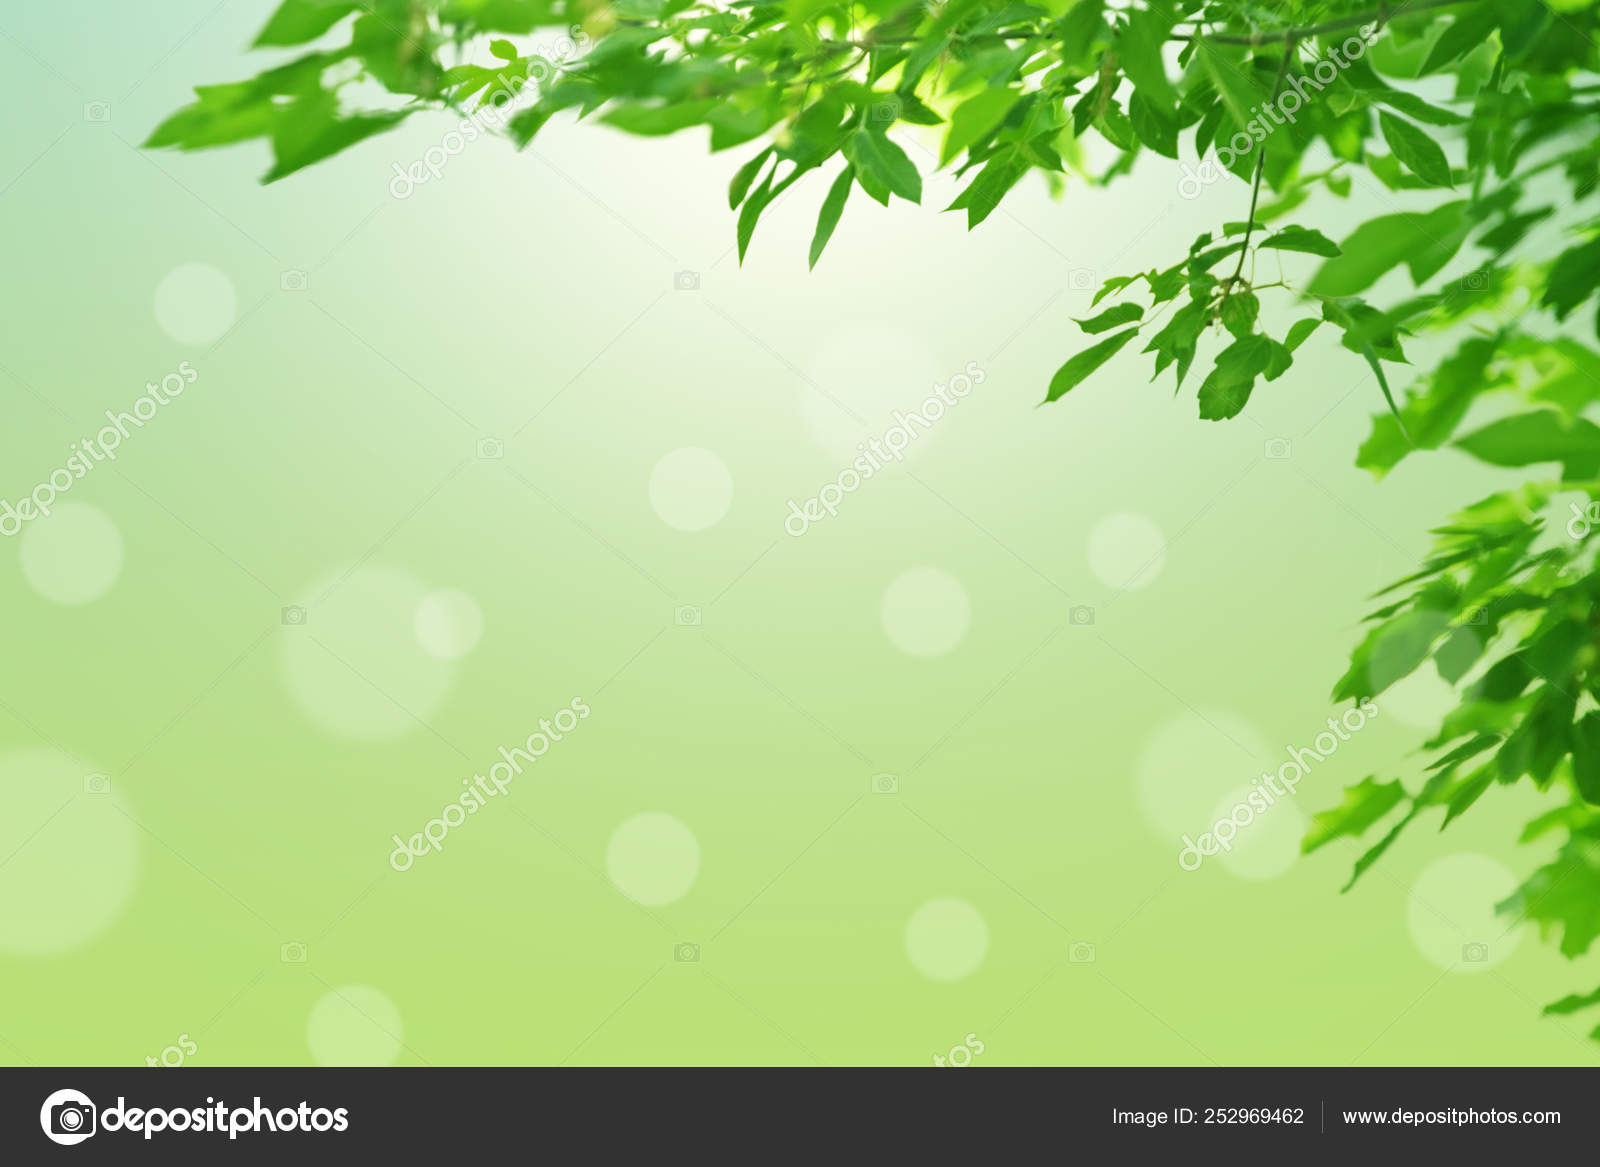 https fr depositphotos com 252969462 stock photo natural spring background green leaves html